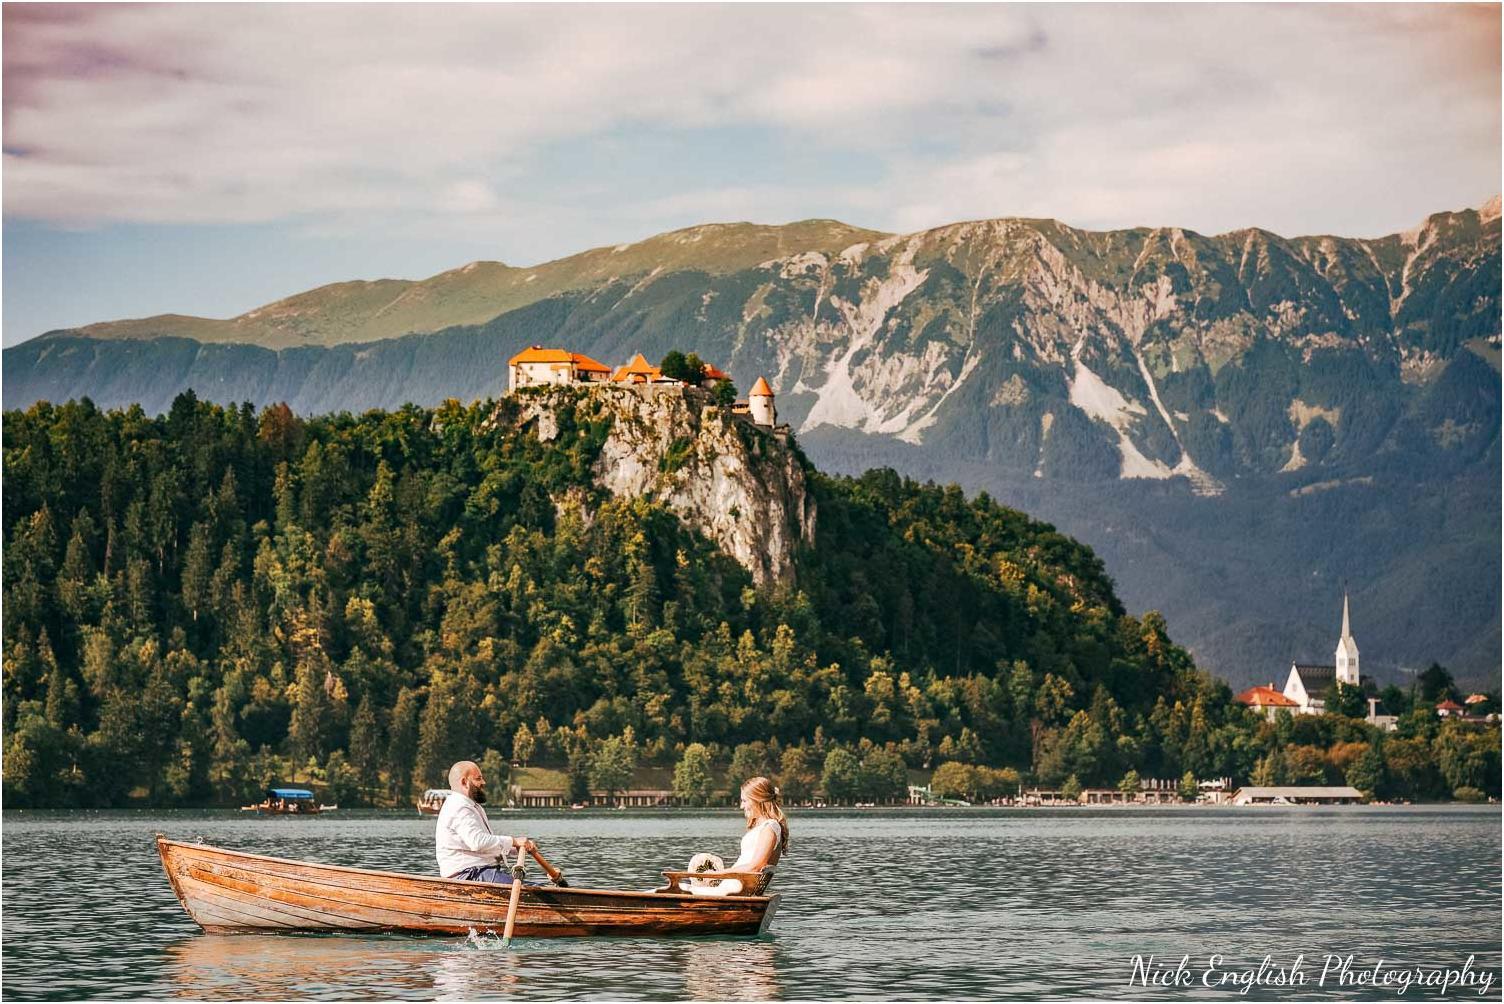 Destination_Wedding_Photographer_Slovenia_Nick_English_Photography-70-7.jpg